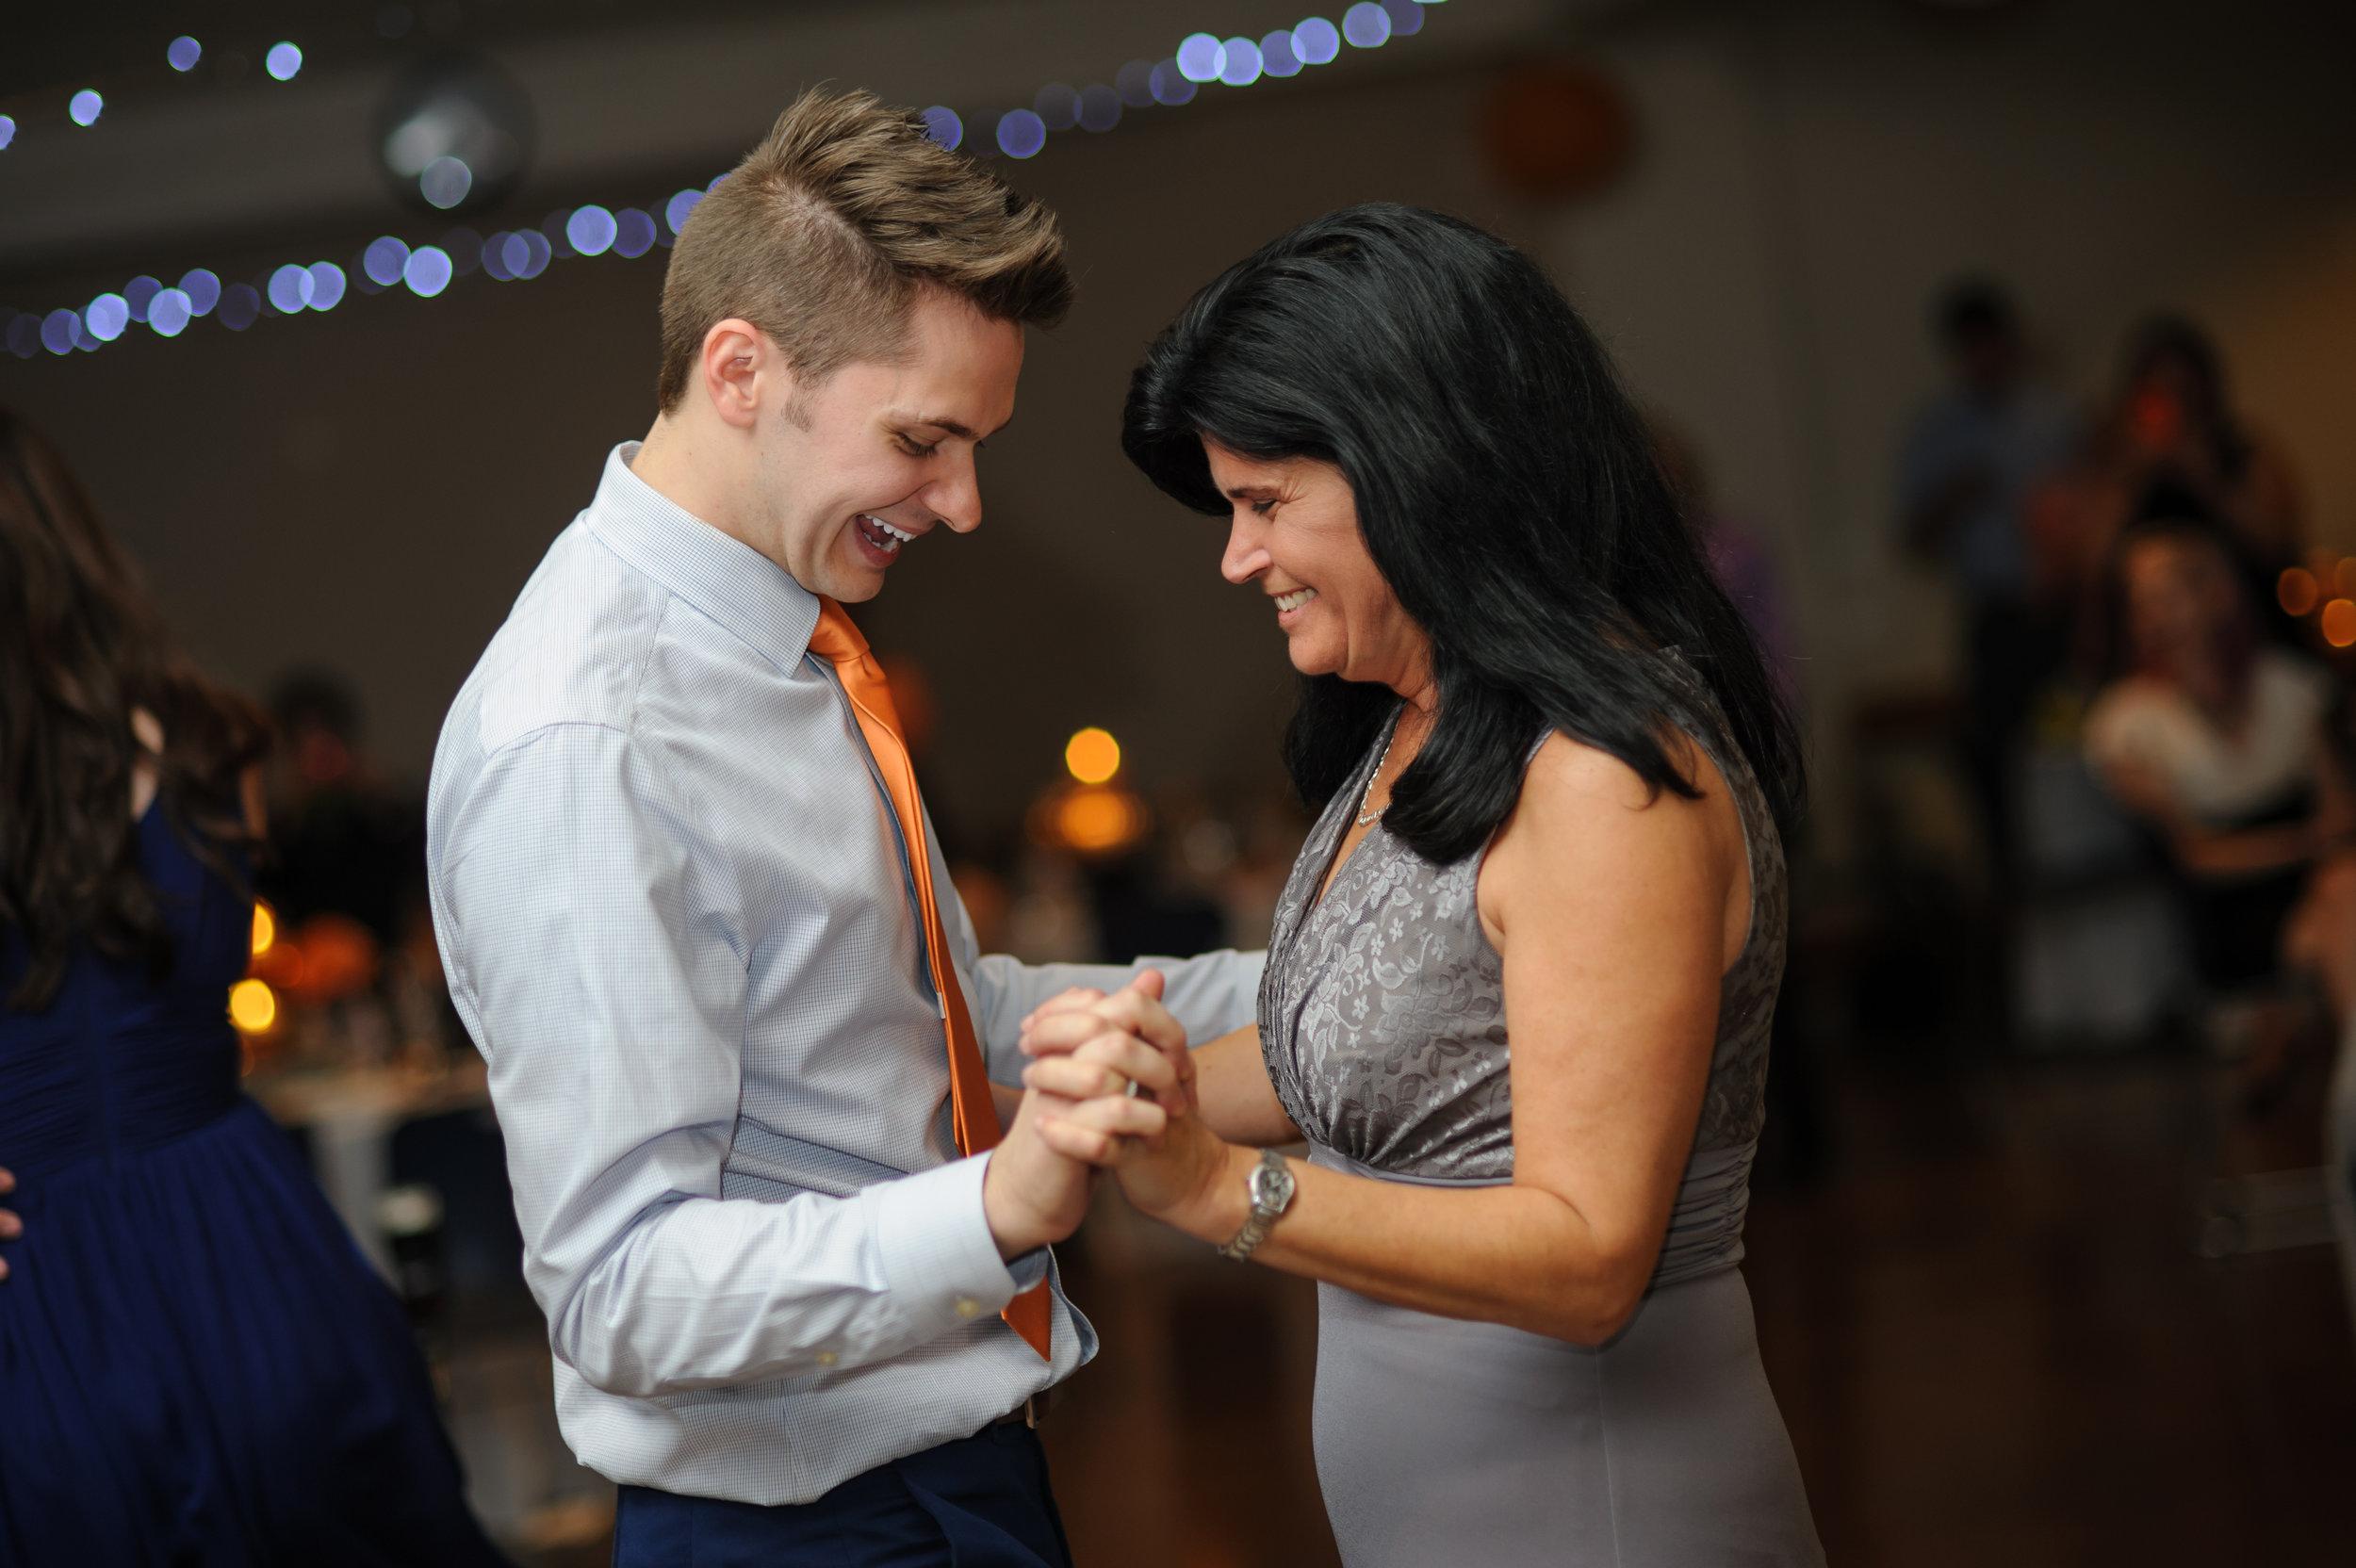 josh-parker-012-same-sex-sacramento-wedding-photographer-katherine-nicole-photography.JPG